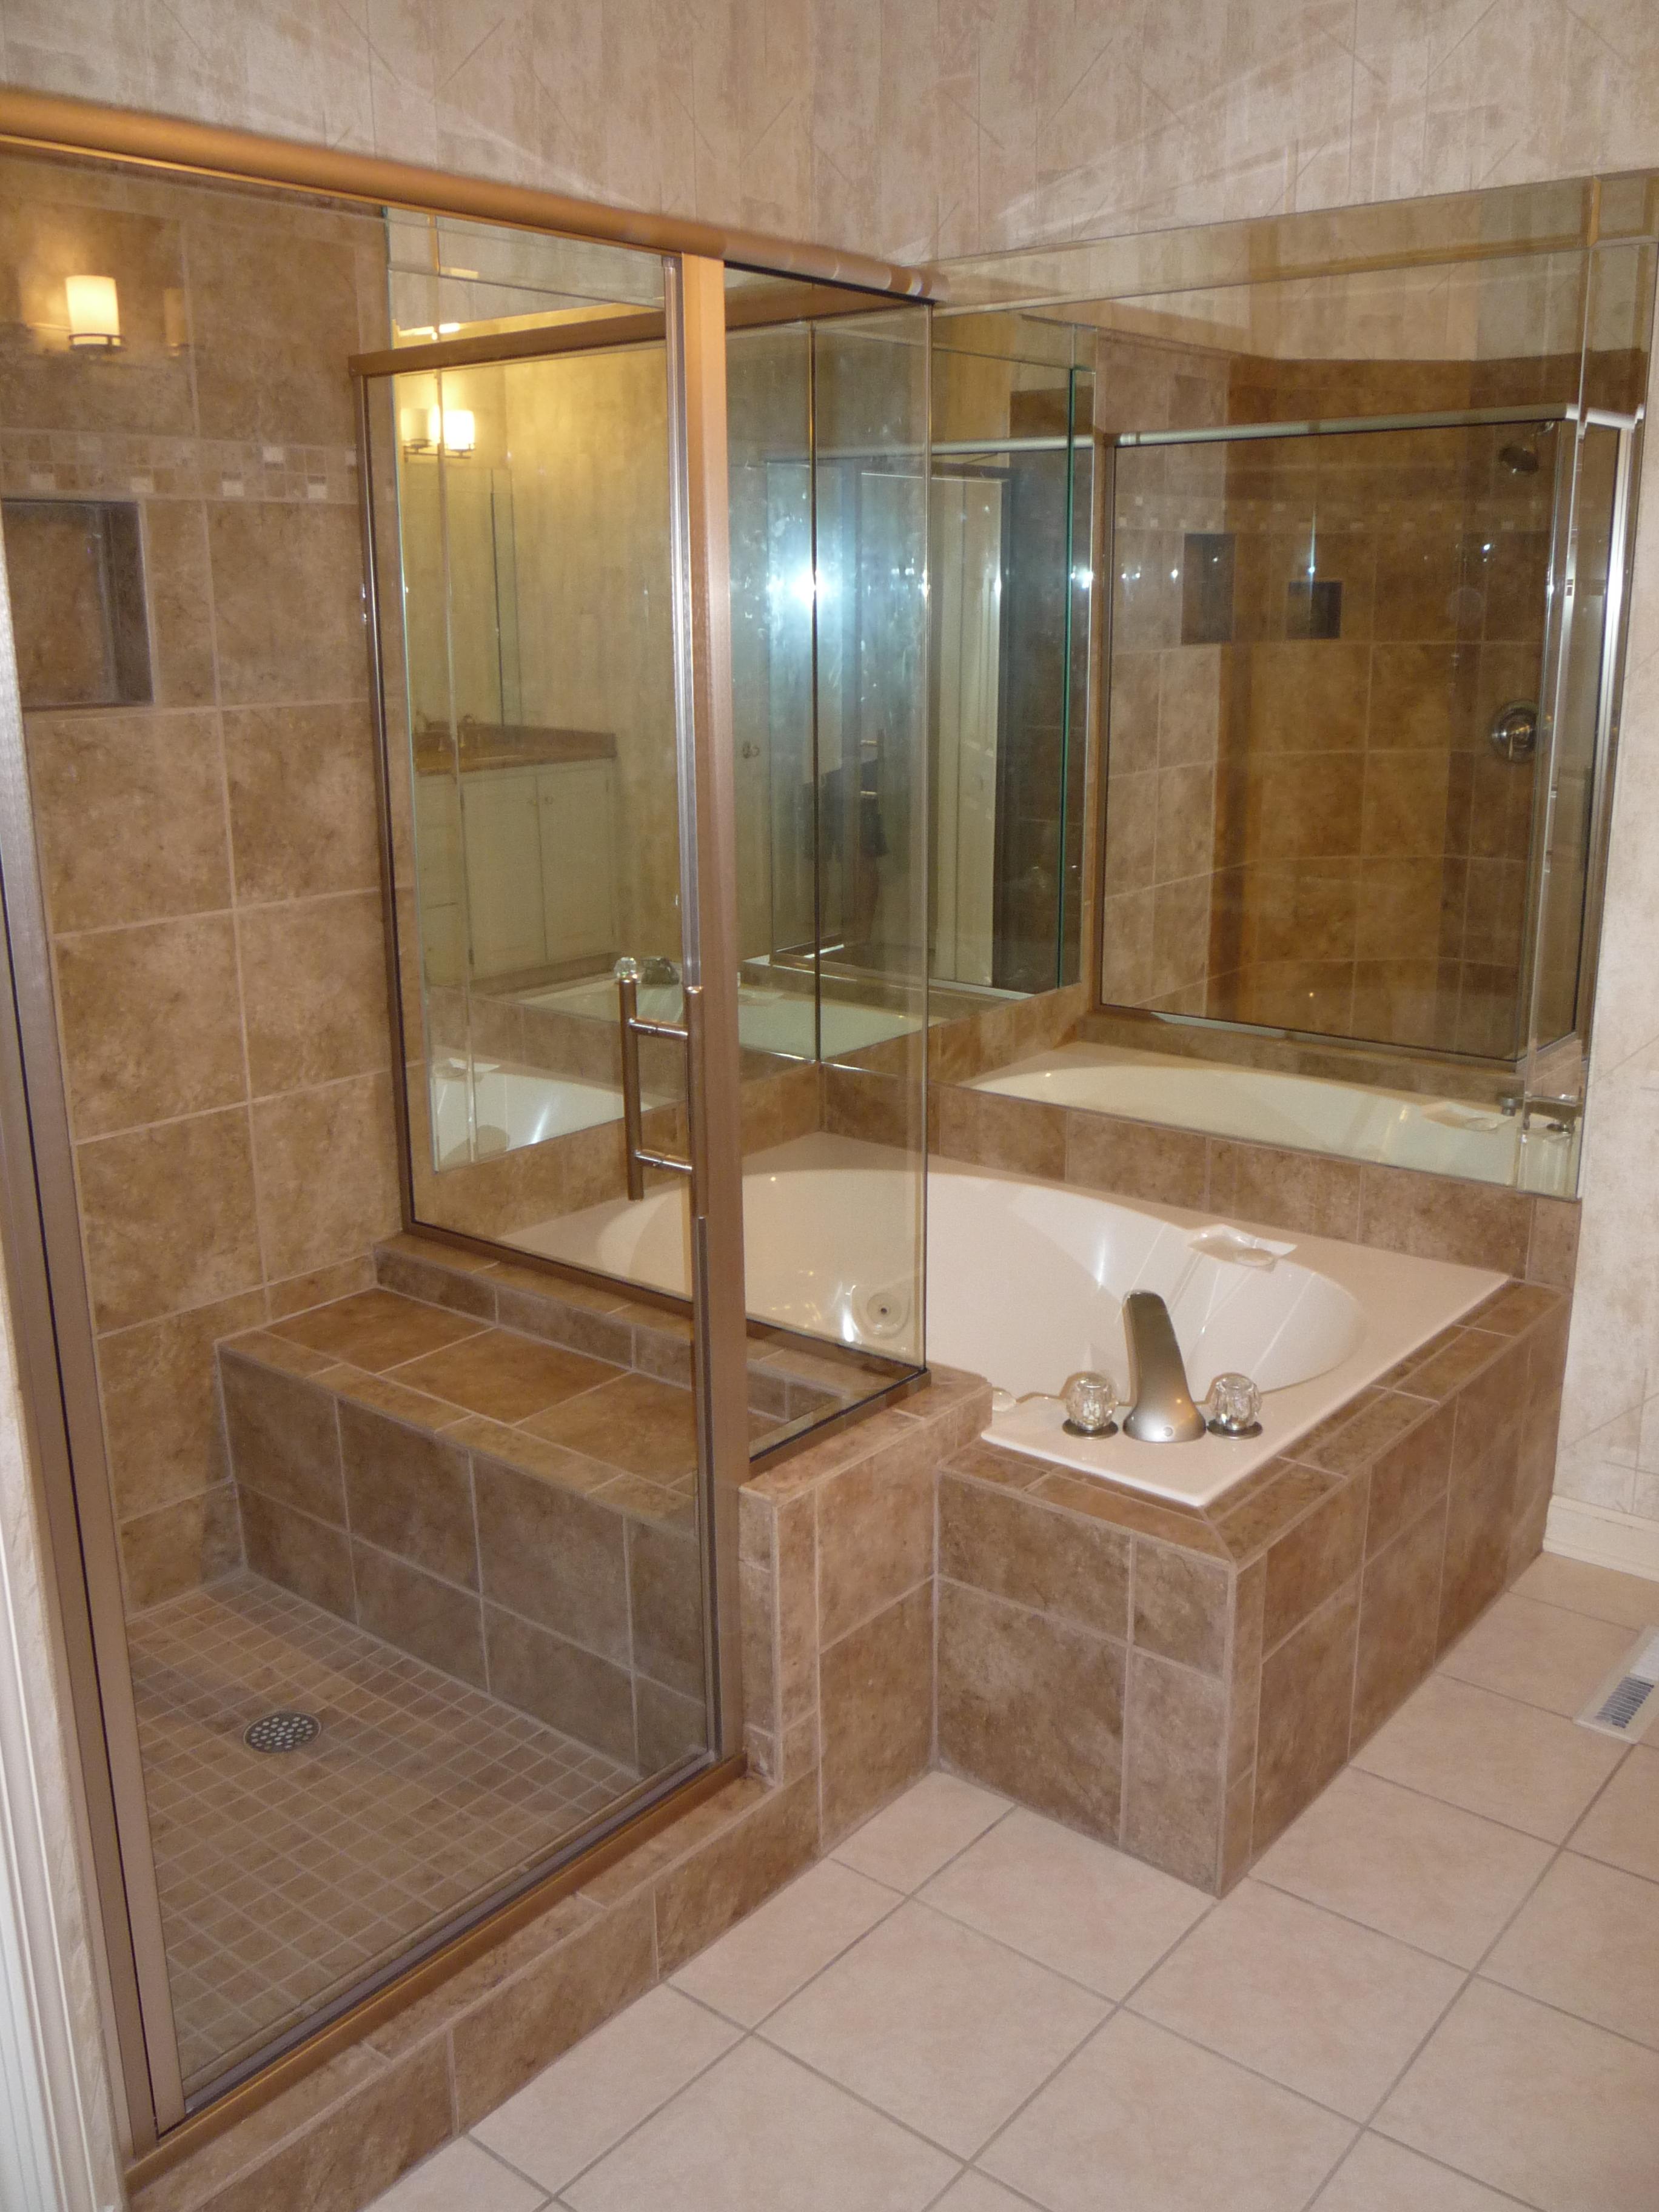 Hugh's Bathroom Remodel 002